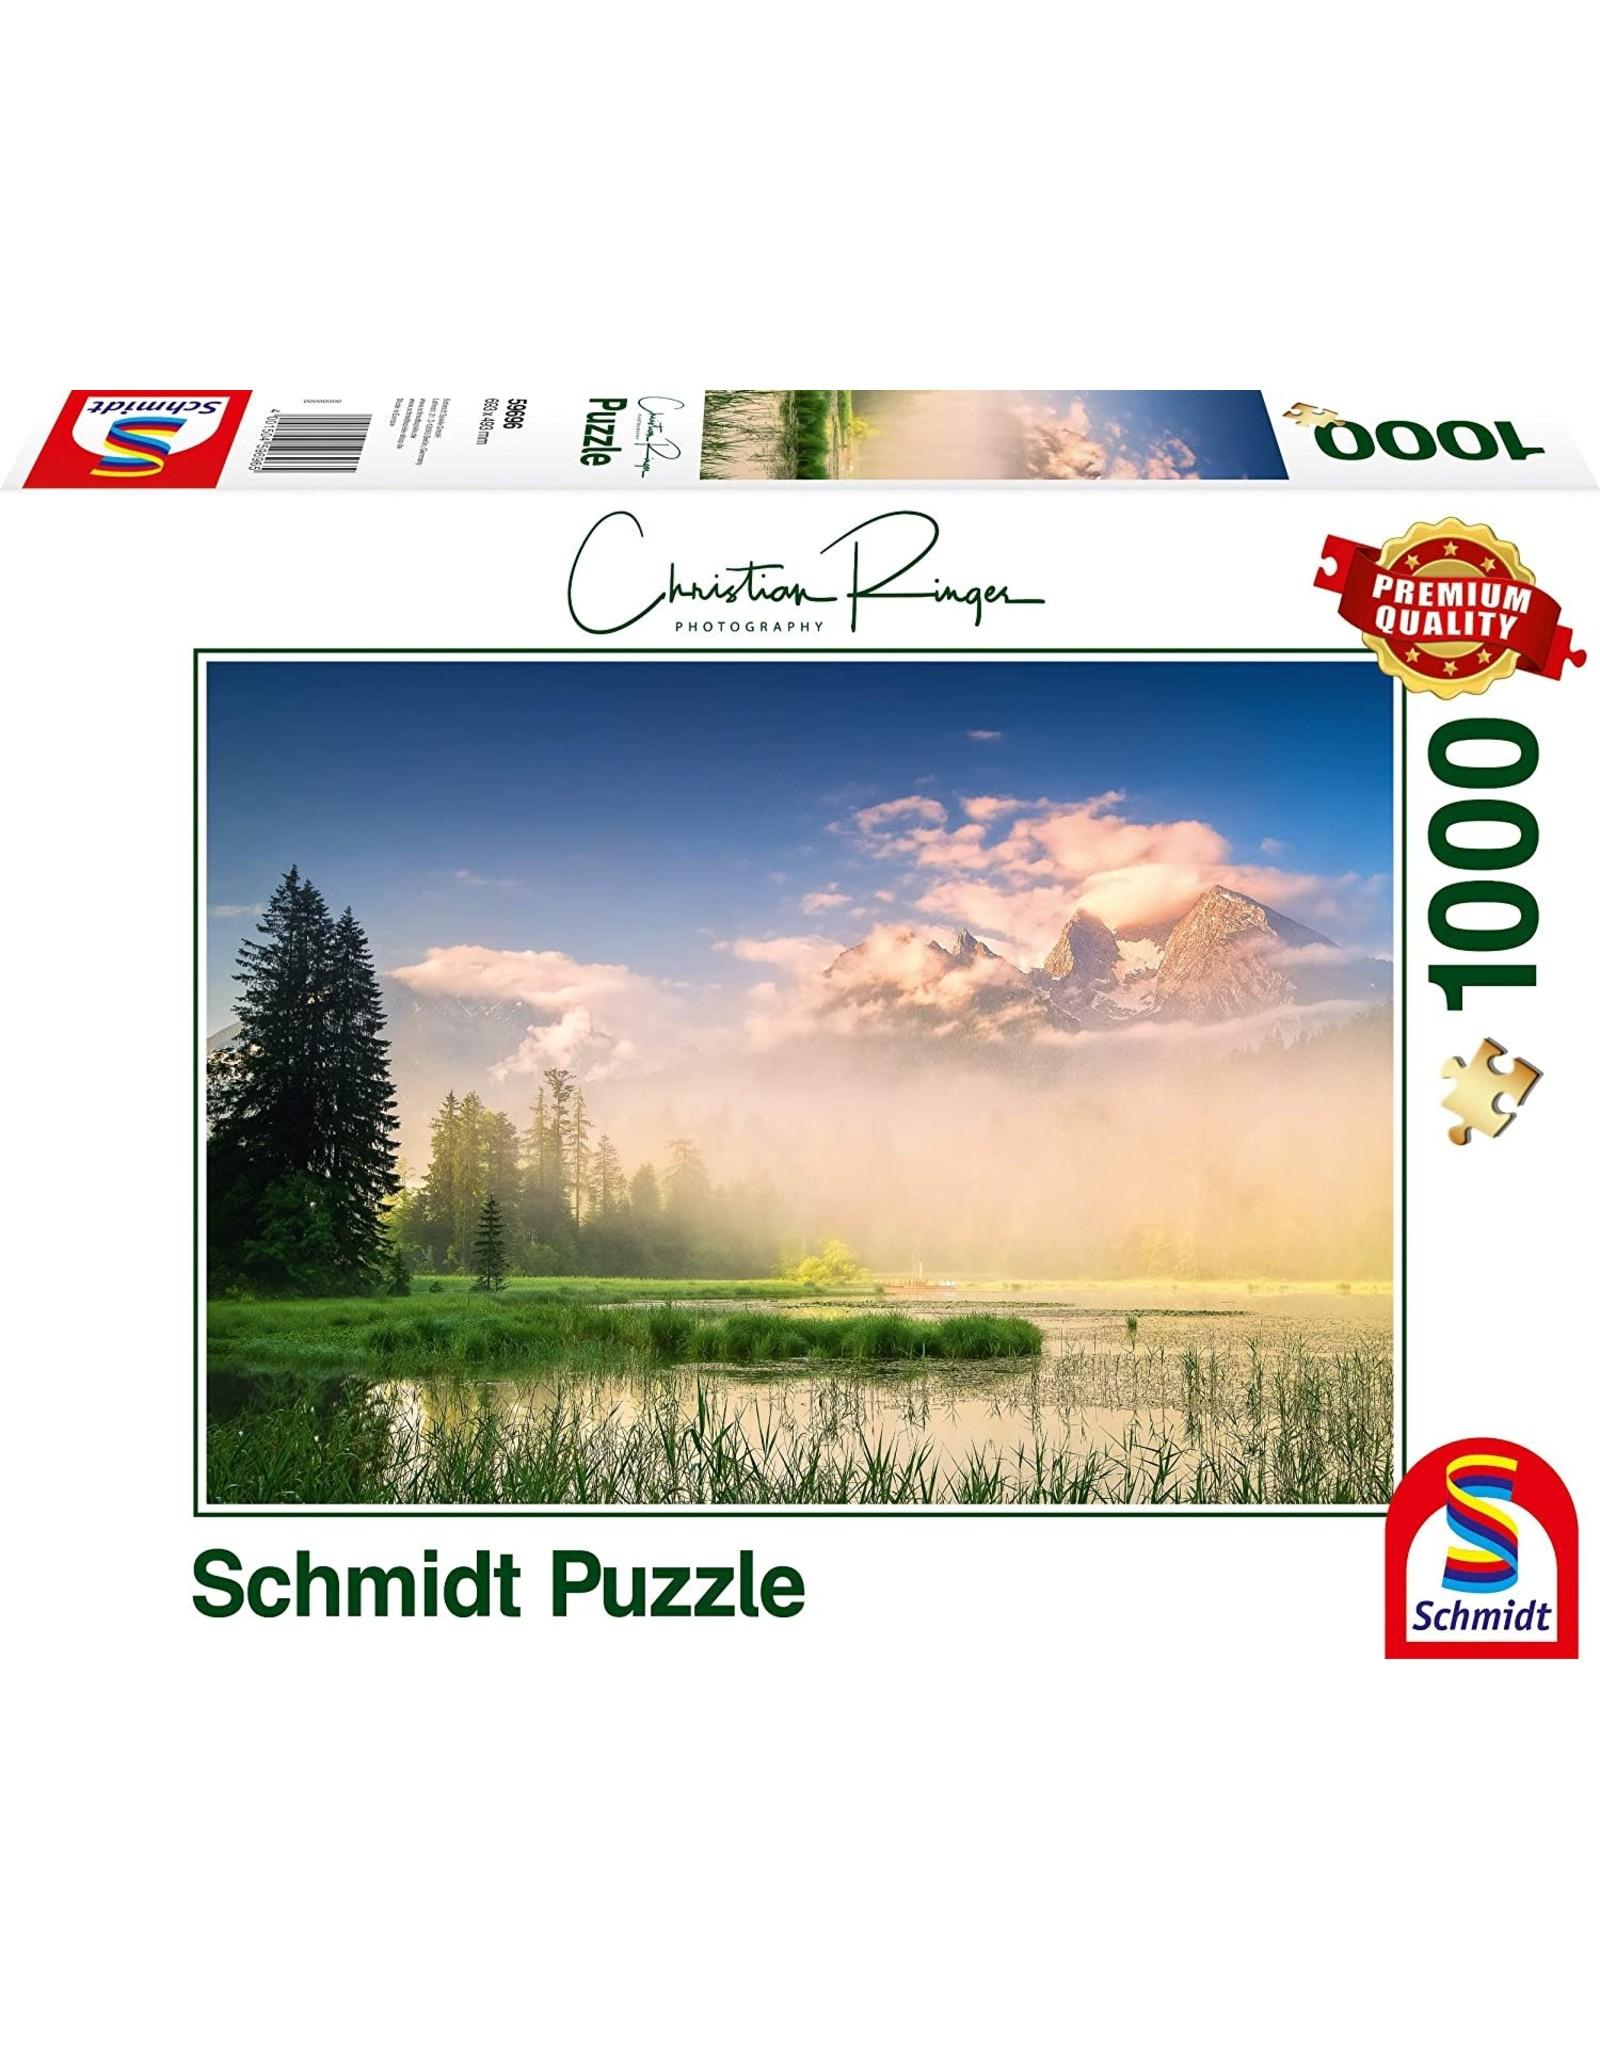 Schmidt Lake Taubensee Puzzle 1000 Pc